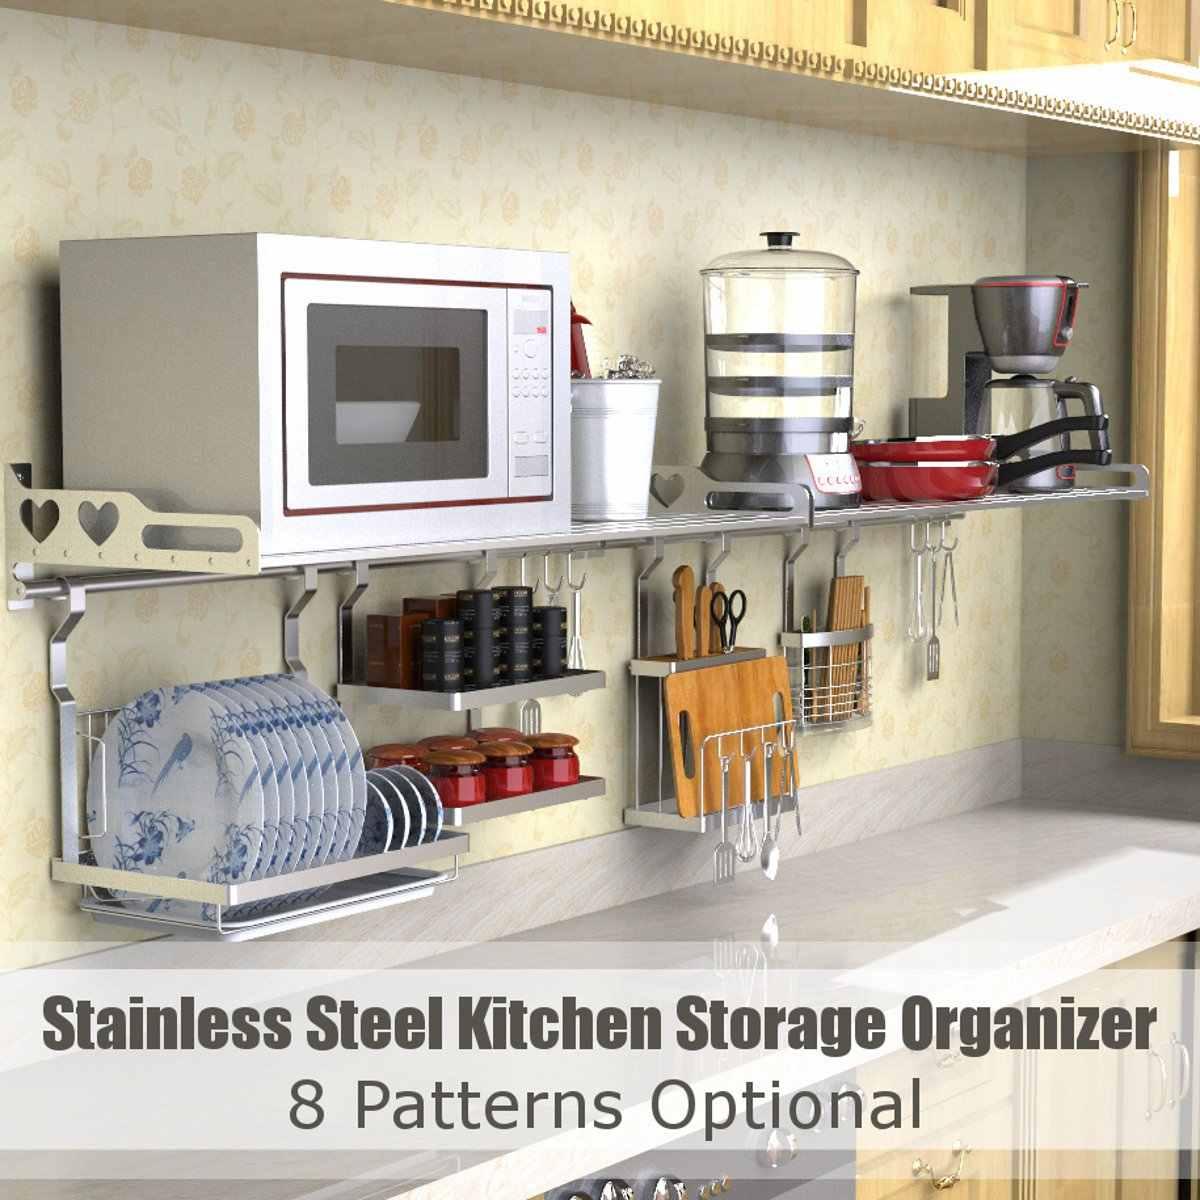 8 Types Stainless Steel Kitchen Organizer Multifunction Dish Drying Rack Wall Hanging Storage Holder Tableware Shelf Drainer Racks Holders Aliexpress